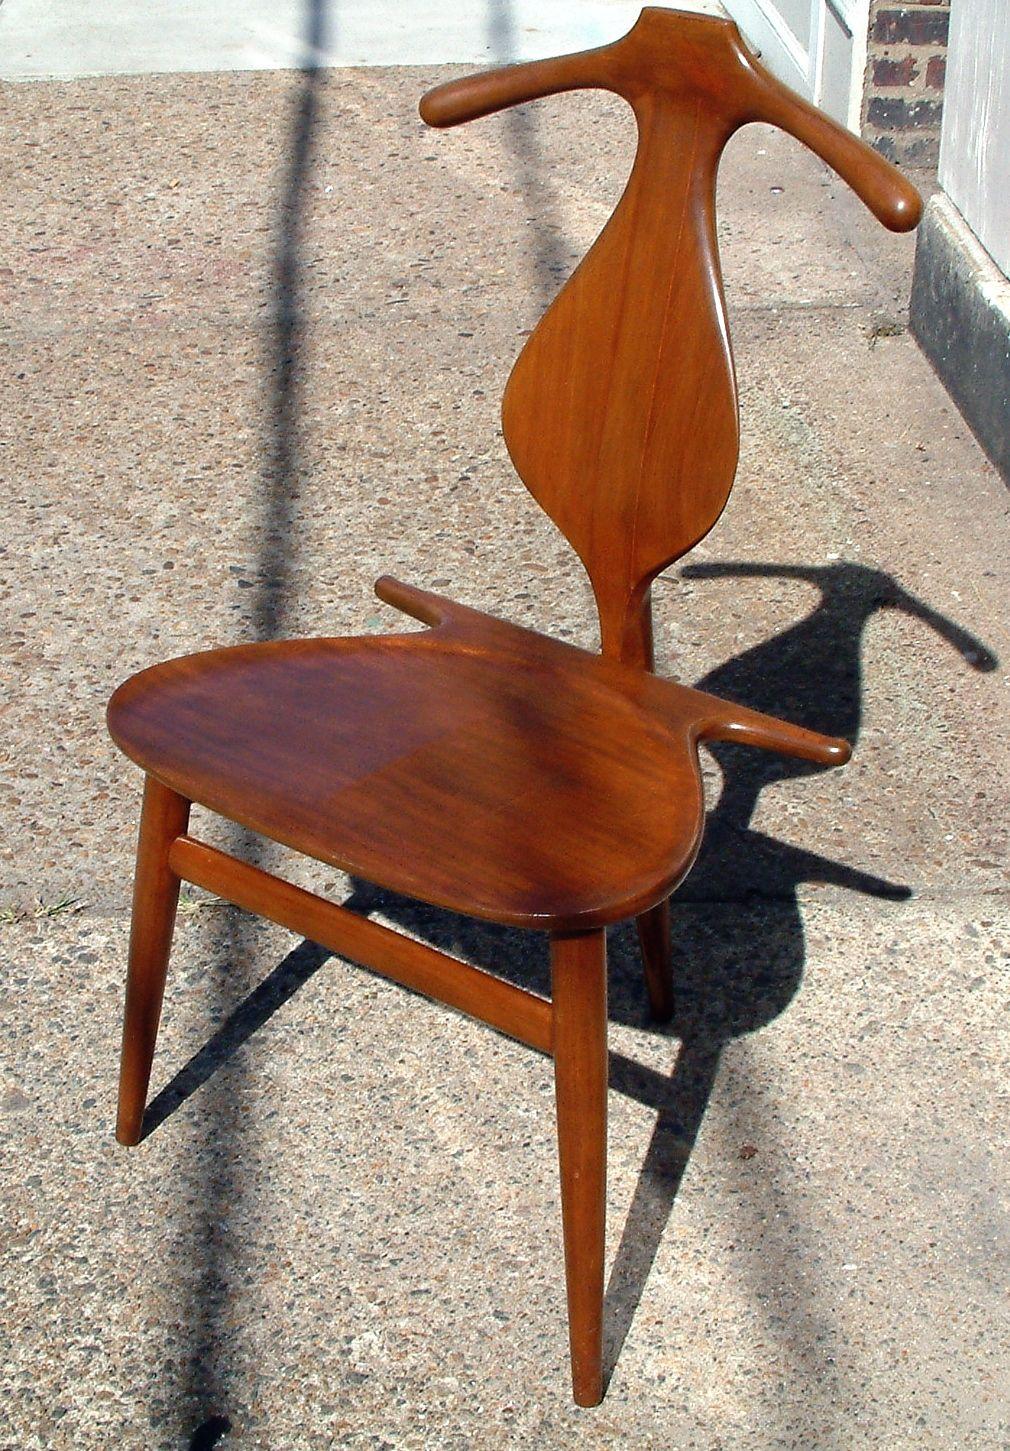 hans wegner valet chair sold hans wegner pinterest. Black Bedroom Furniture Sets. Home Design Ideas